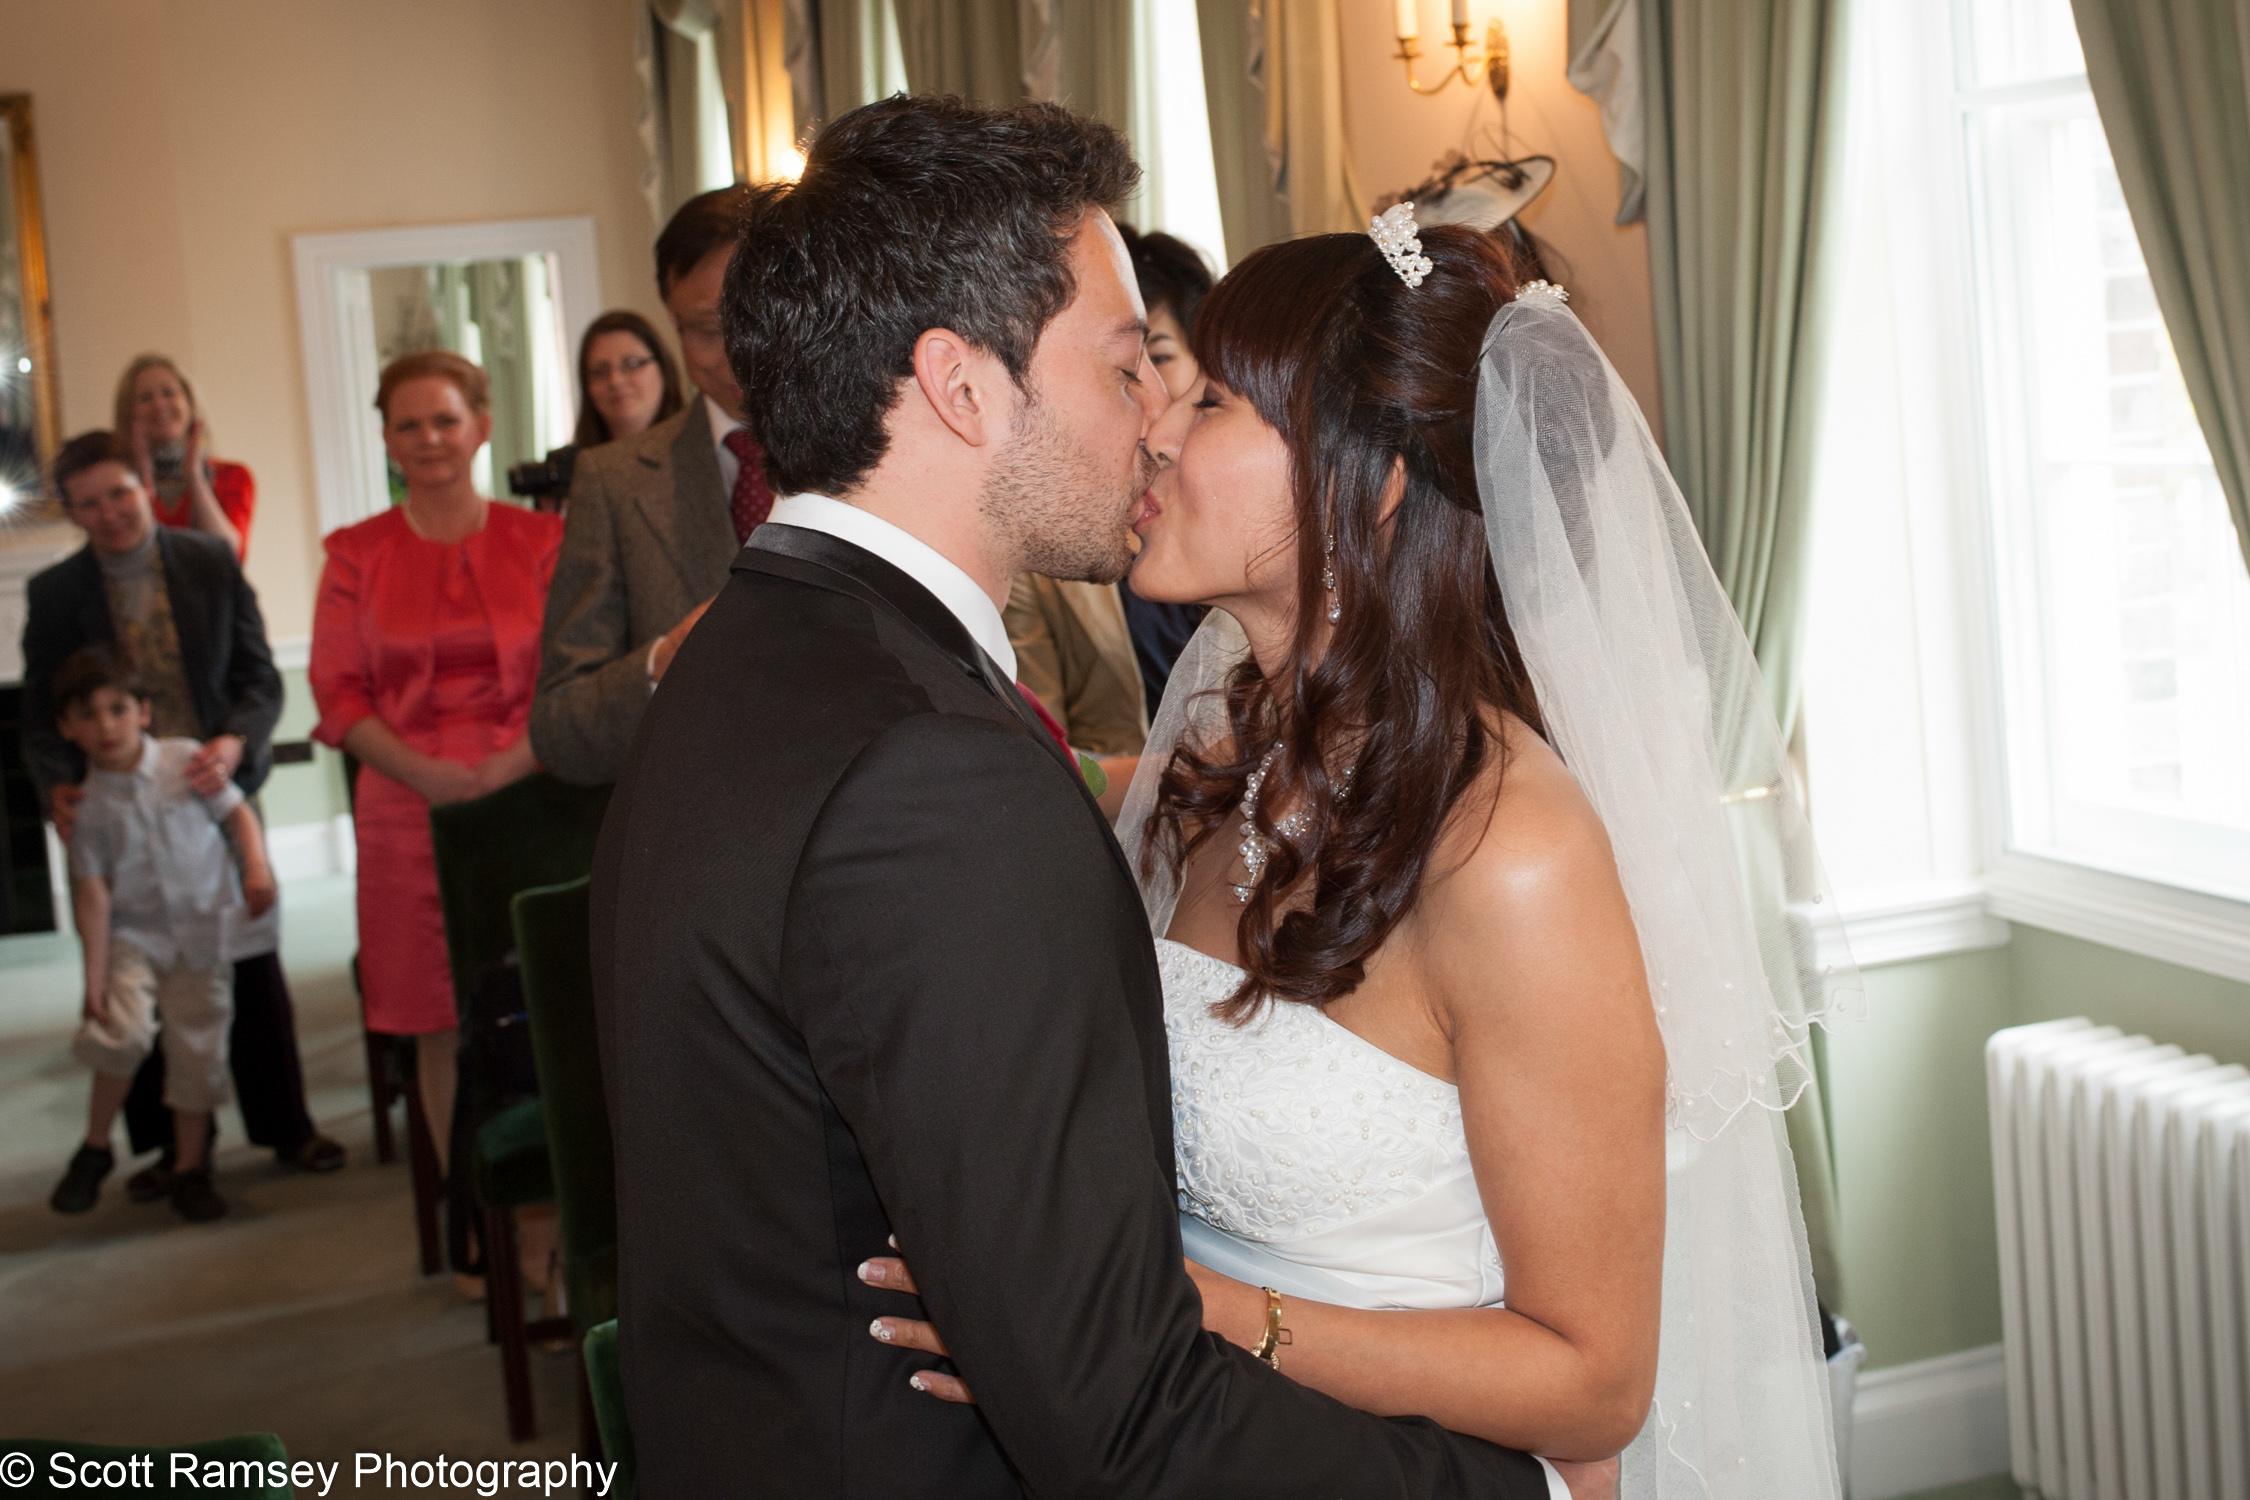 Portsmouth Registry Office Wedding Kiss 040513-18